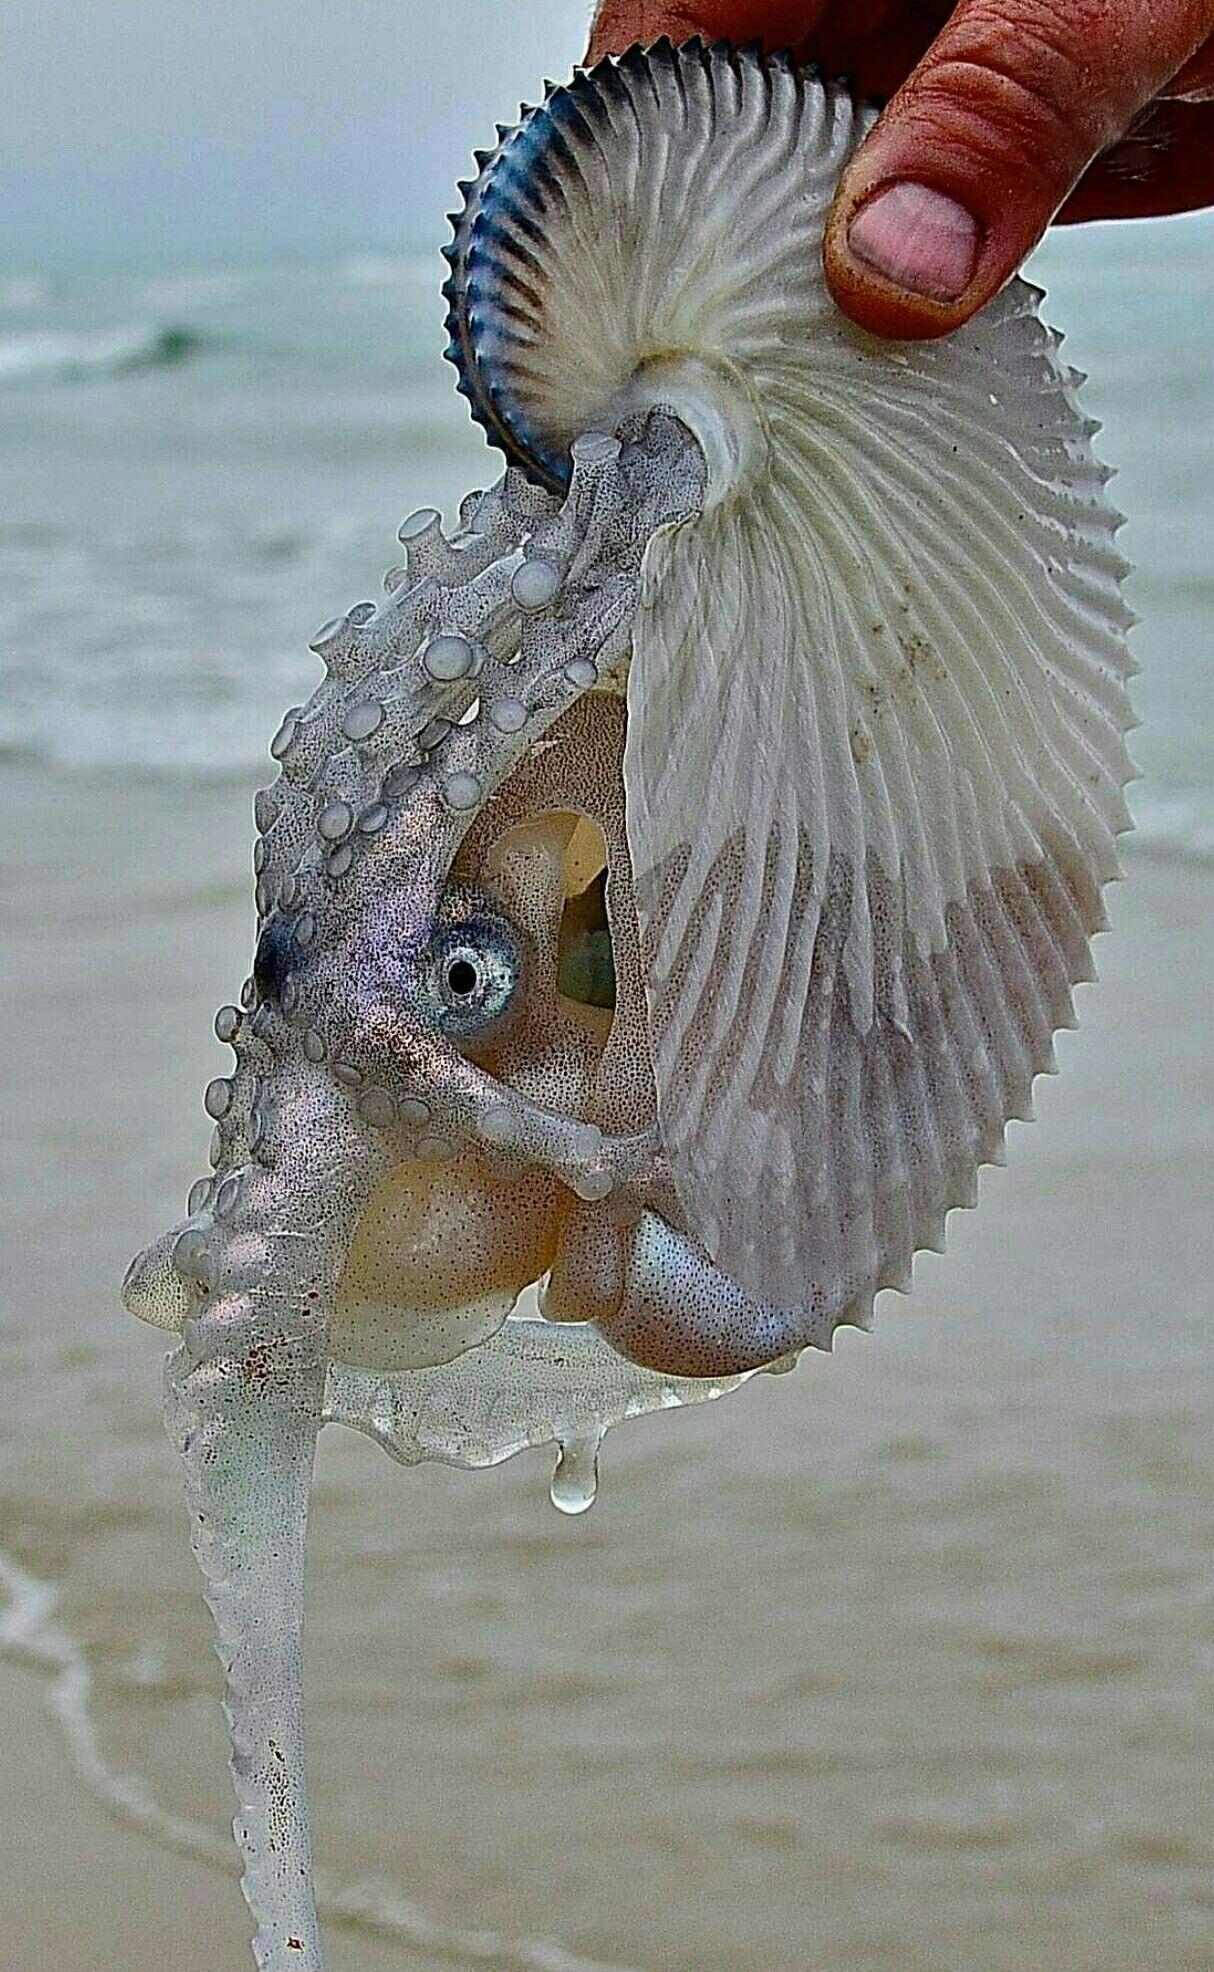 the female argonaut octopus travels the oceans in her paper